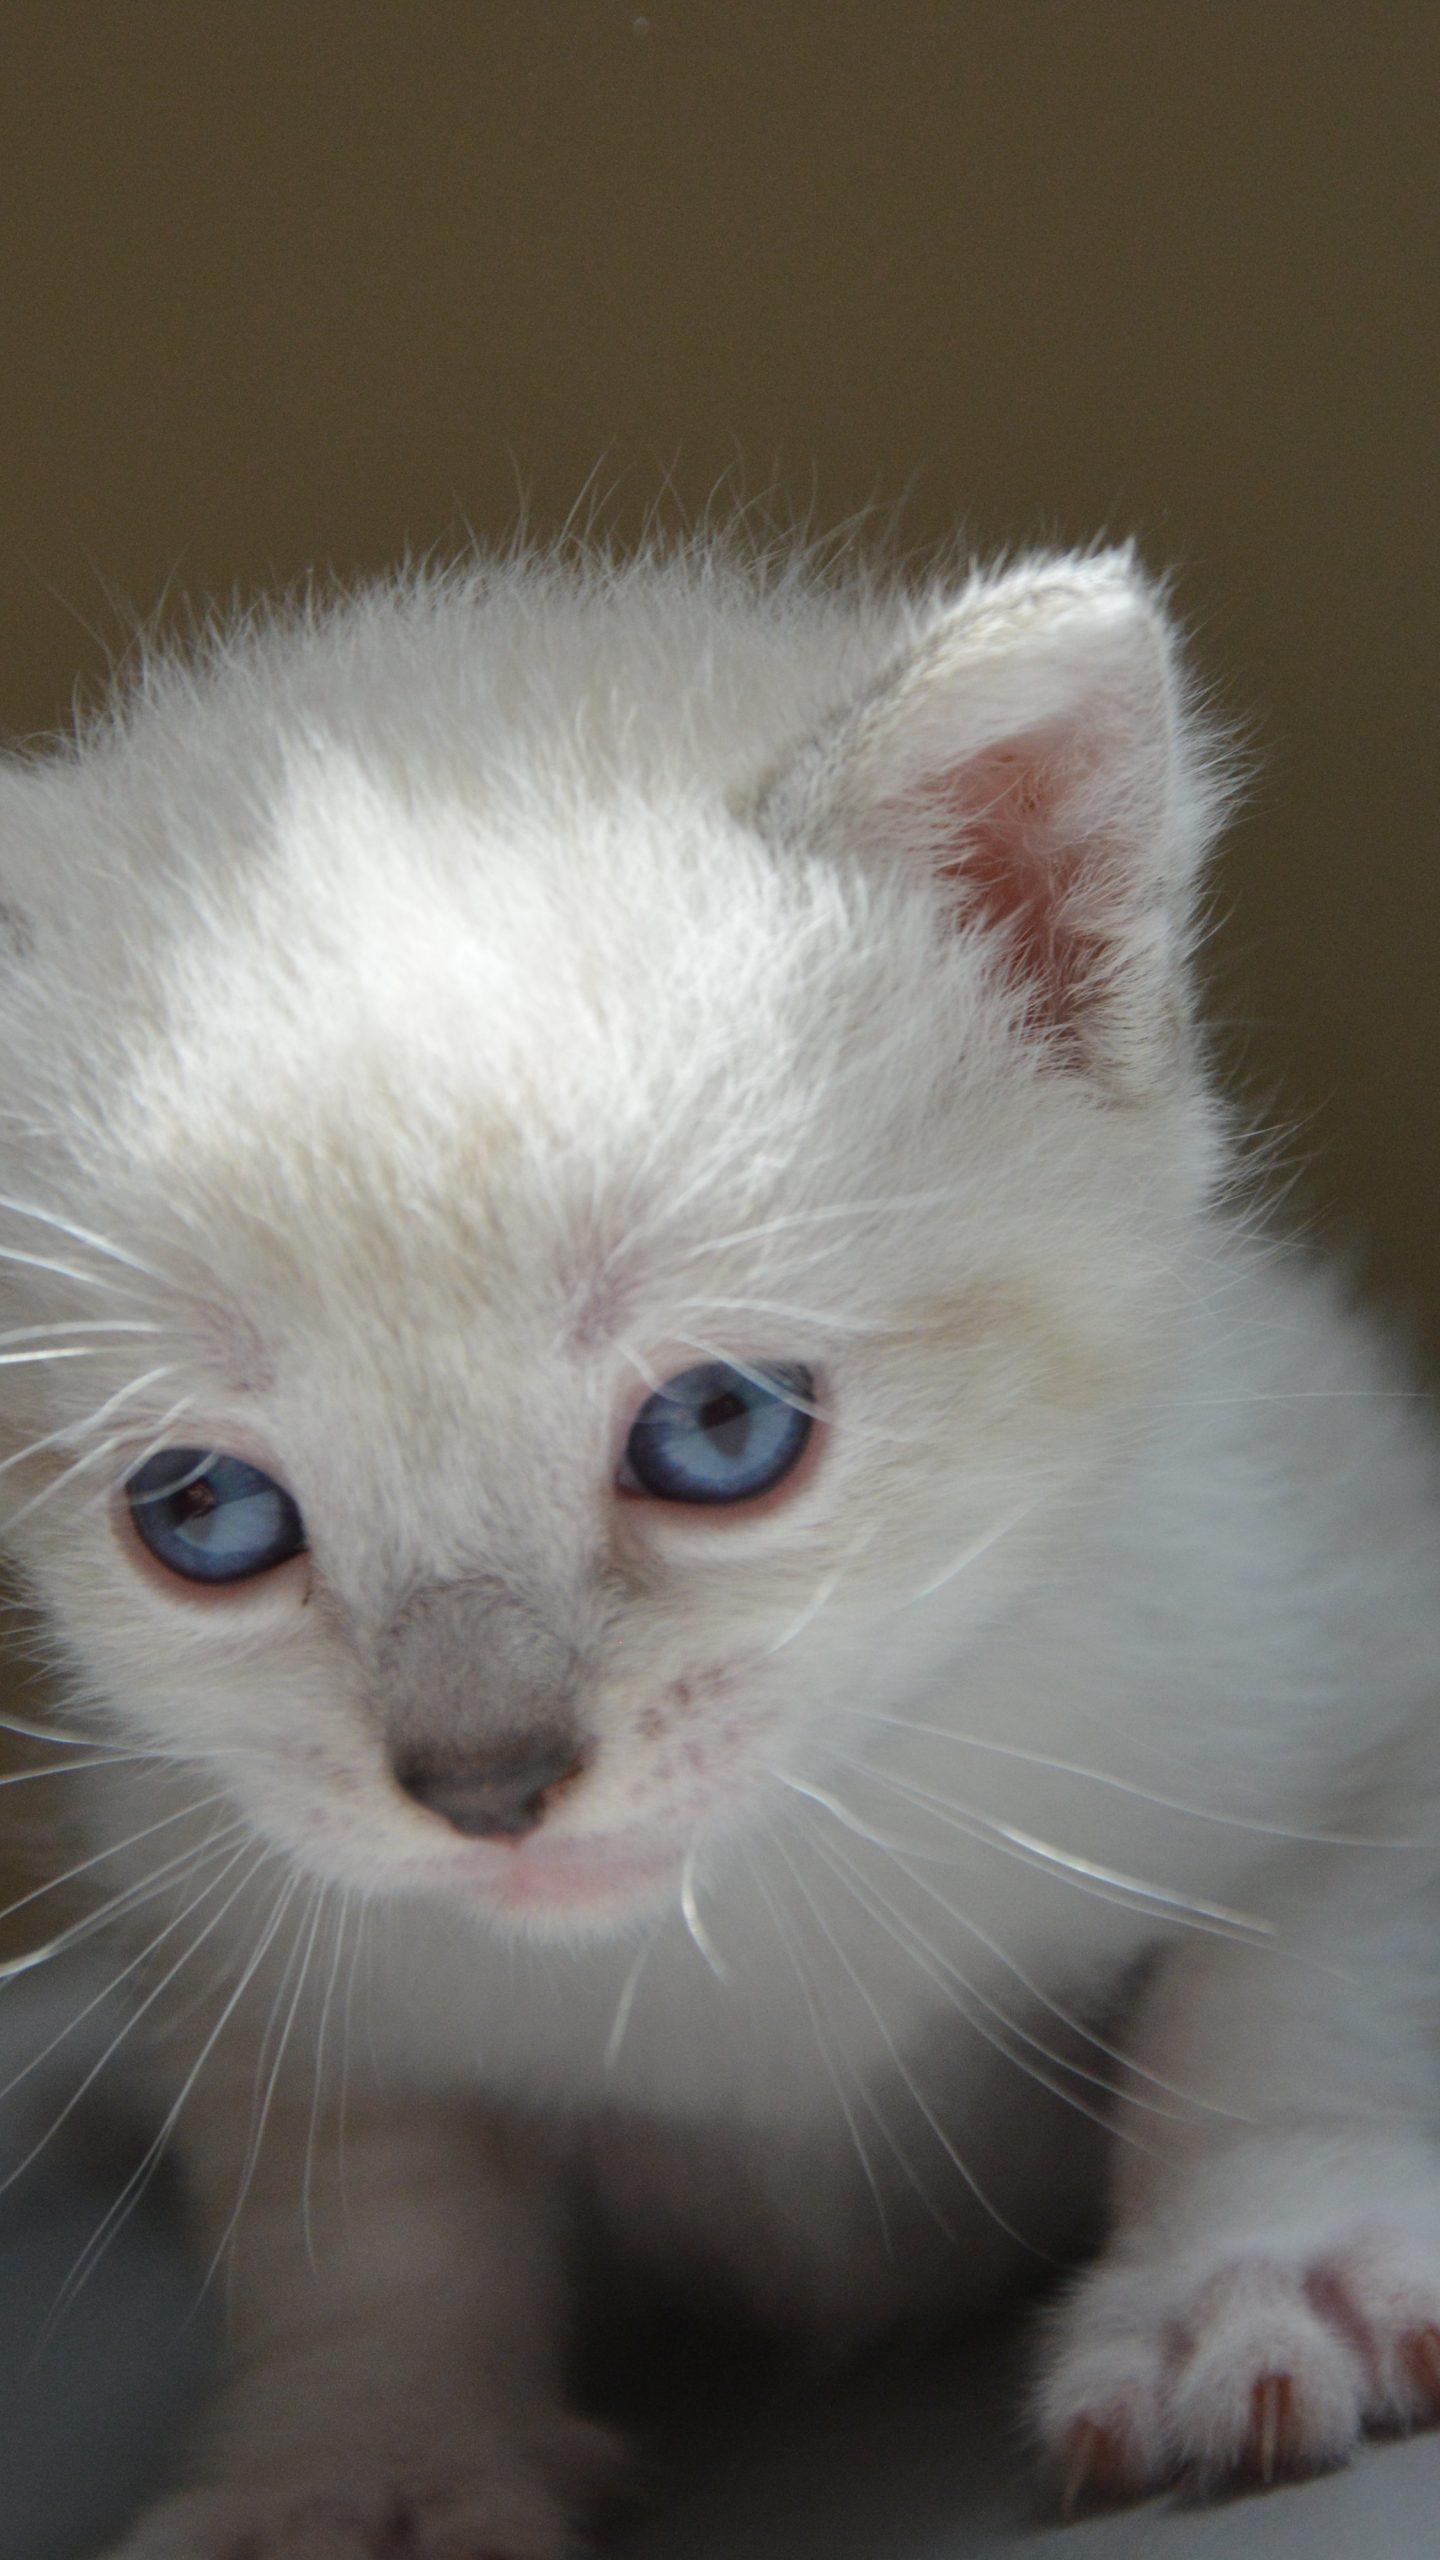 Tiny white kitten with blue eyes 6K UHD Wallpaper  White Cat With Dark Blue Eyes